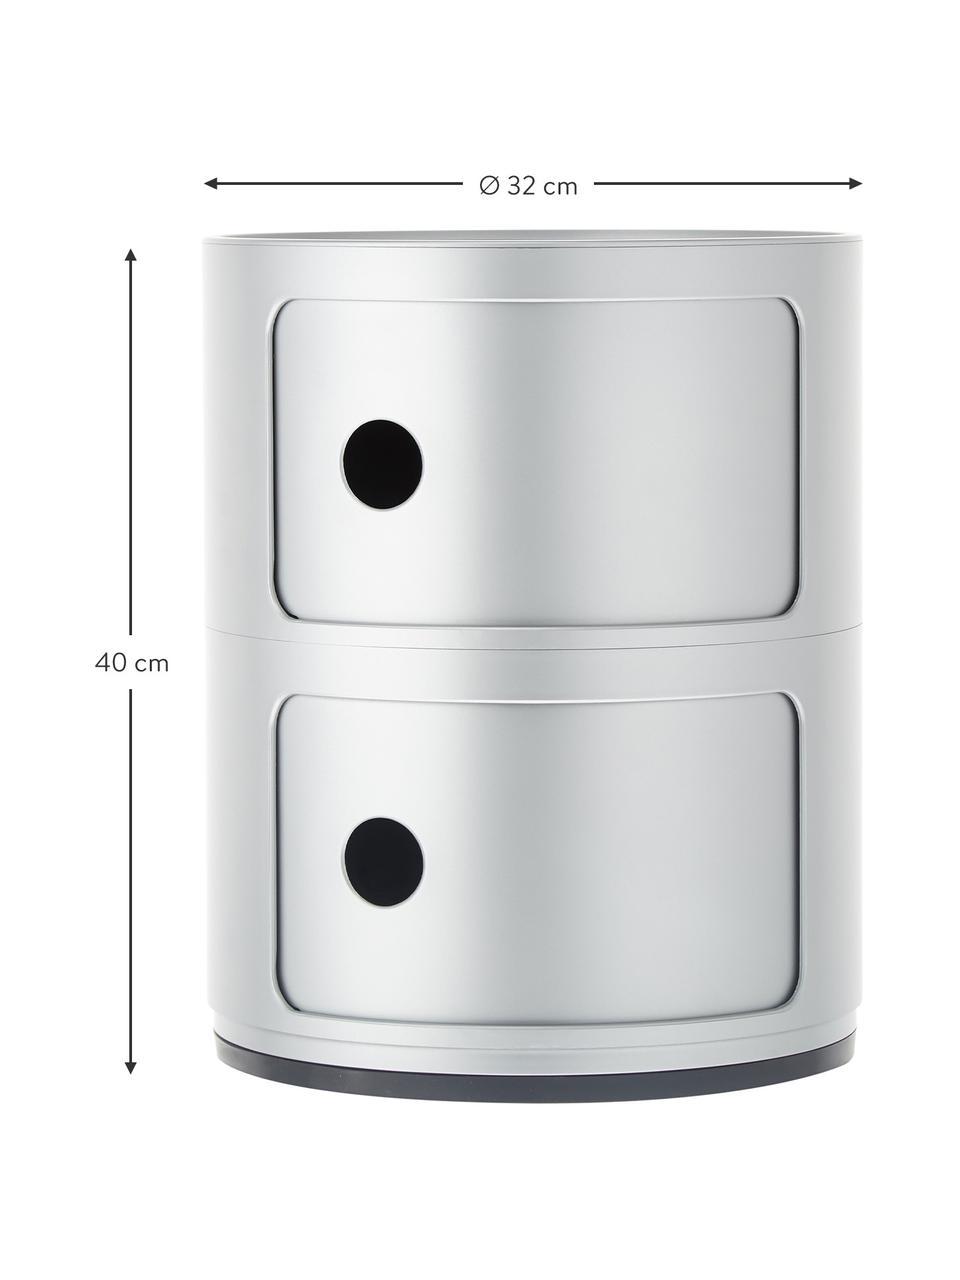 Design Container Componibili 2 Modules, Kunststoff (ABS), lackiert, Silberfarben, Ø 32 x H 40 cm